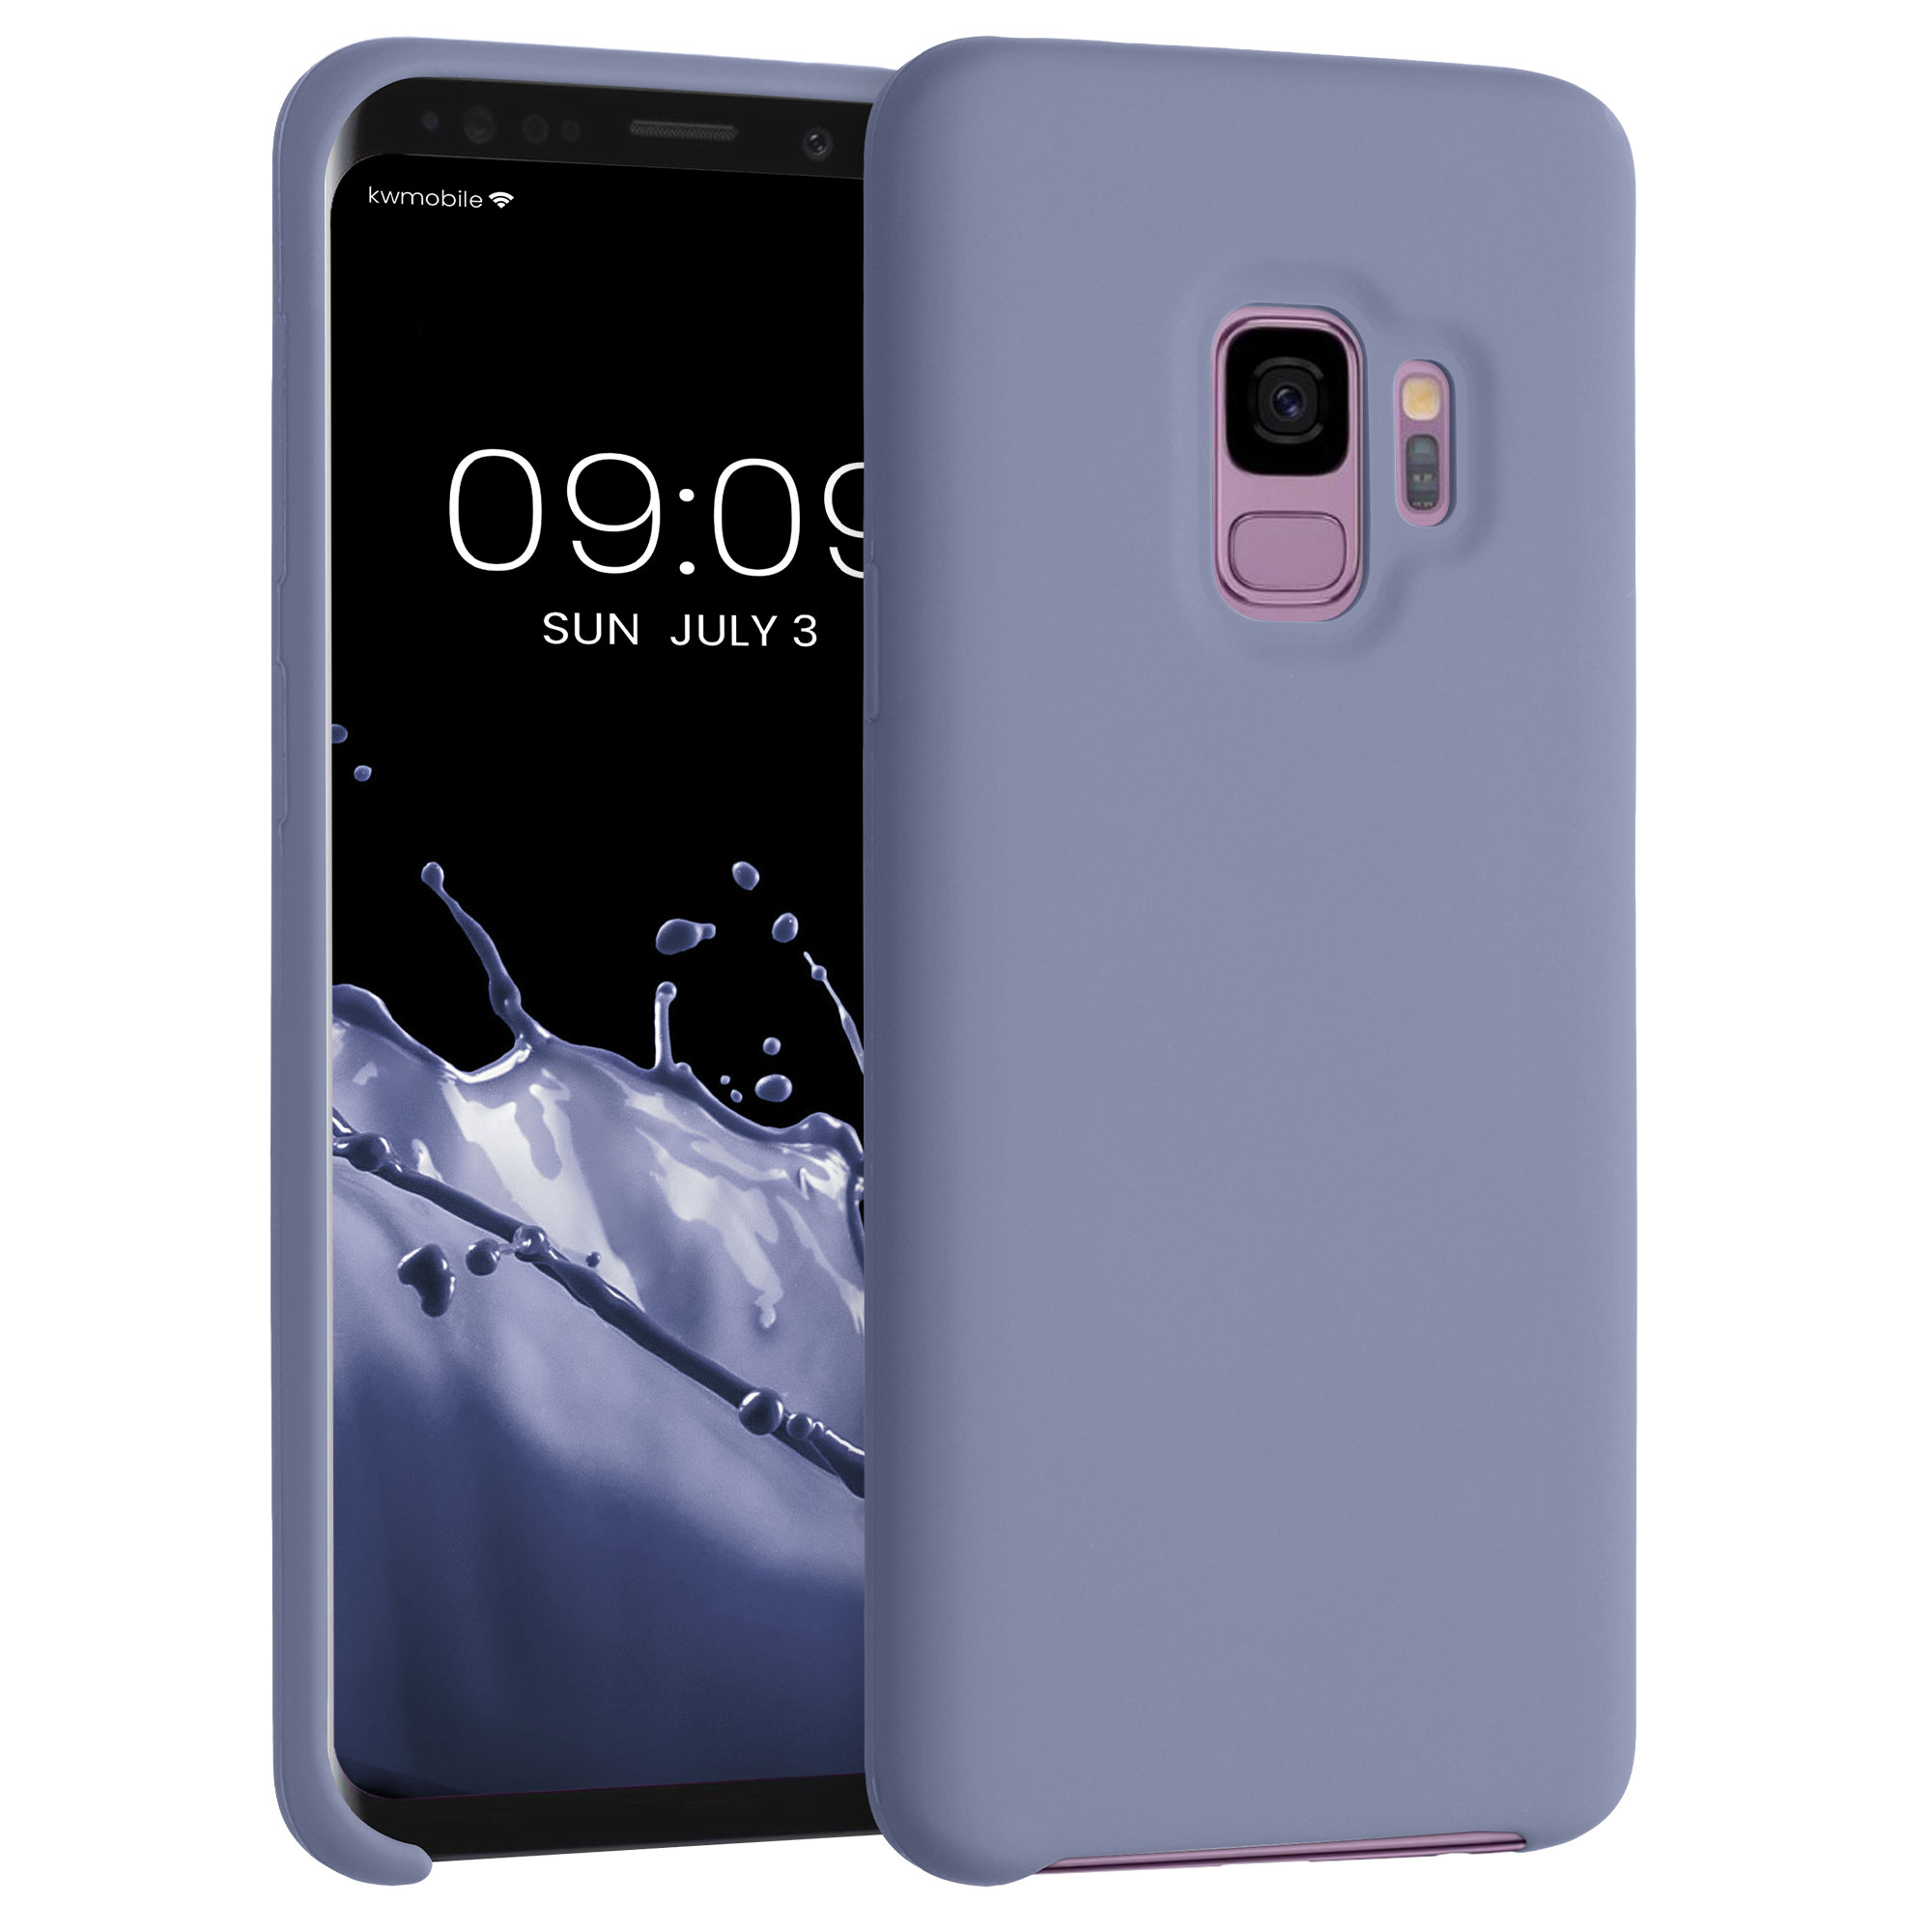 TPU Silikonové pouzdro pro Samsung Galaxy S9 - Soft Flexible Rubber Protective Cover - Lilac